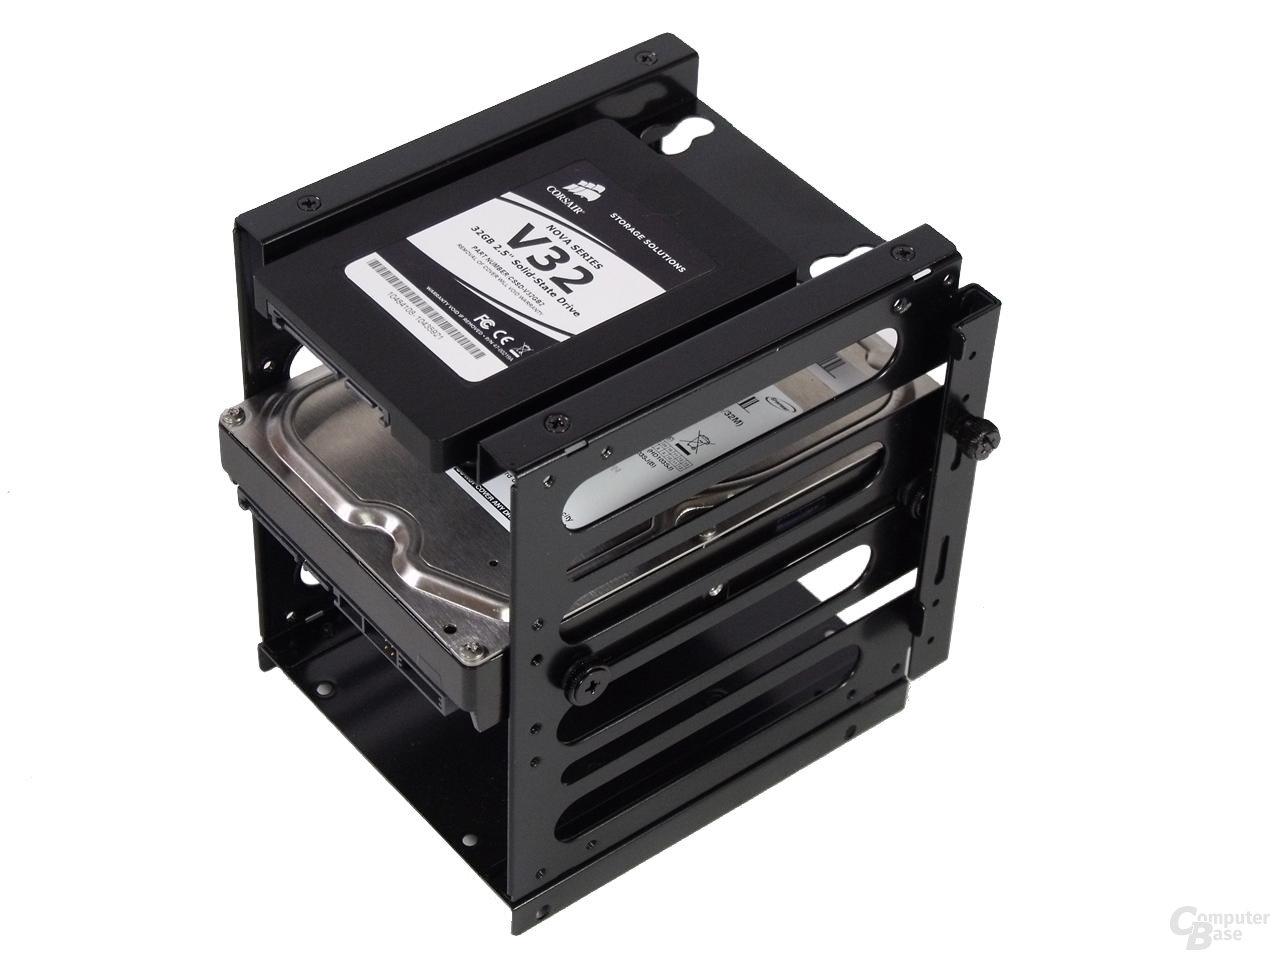 LanCool PC-K63 – Festplattenkäfig